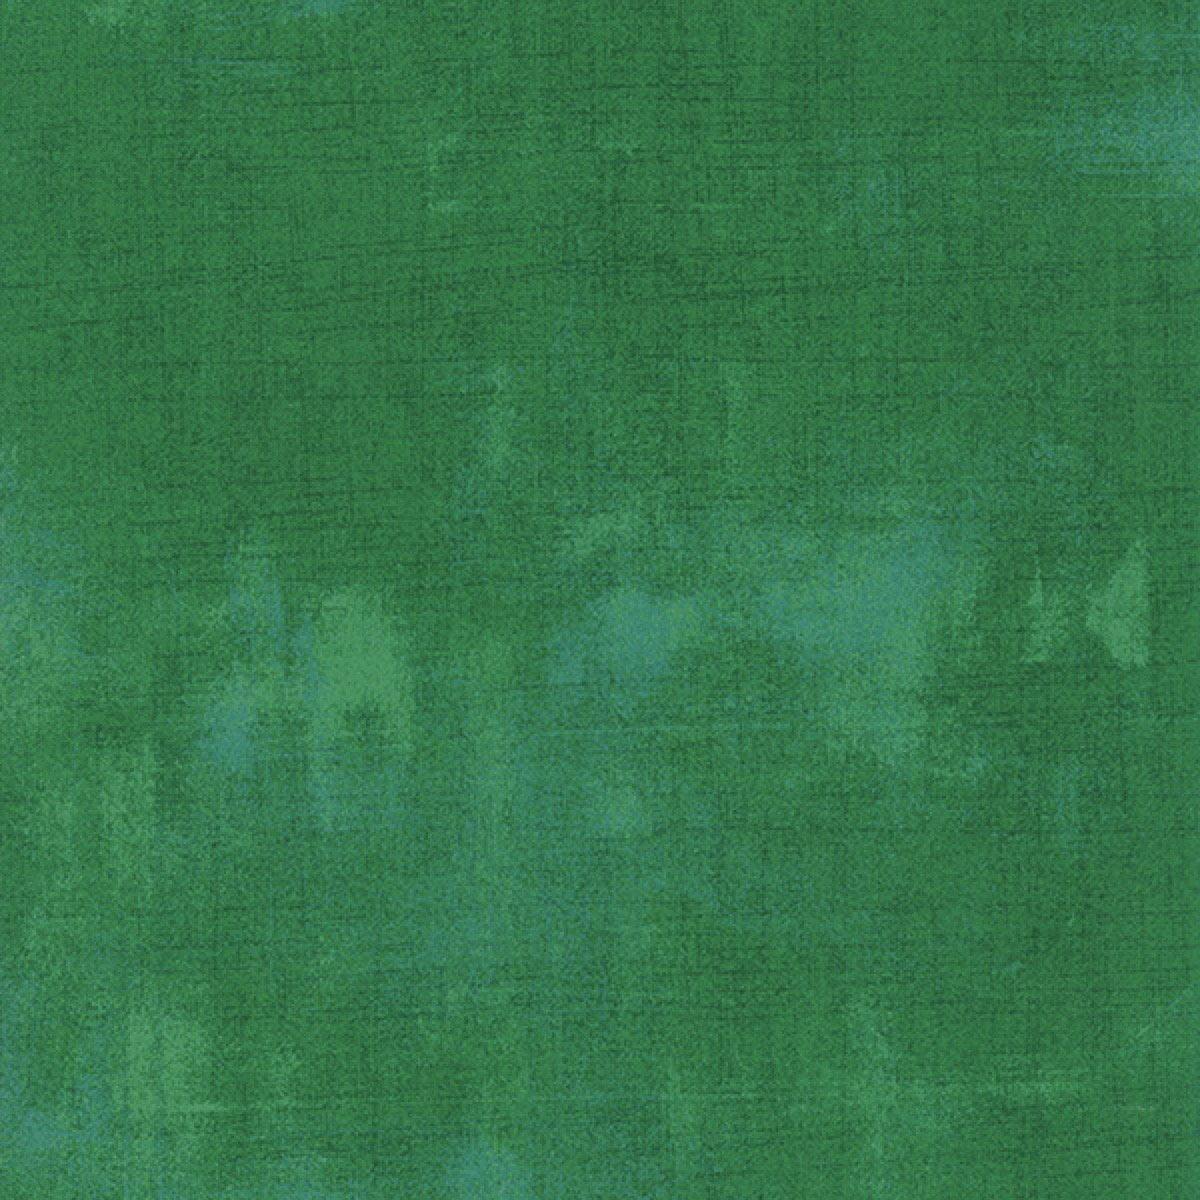 Moda Fabrics Grunge Texture New Colors 2017 Leprechaun Cotton Fabric